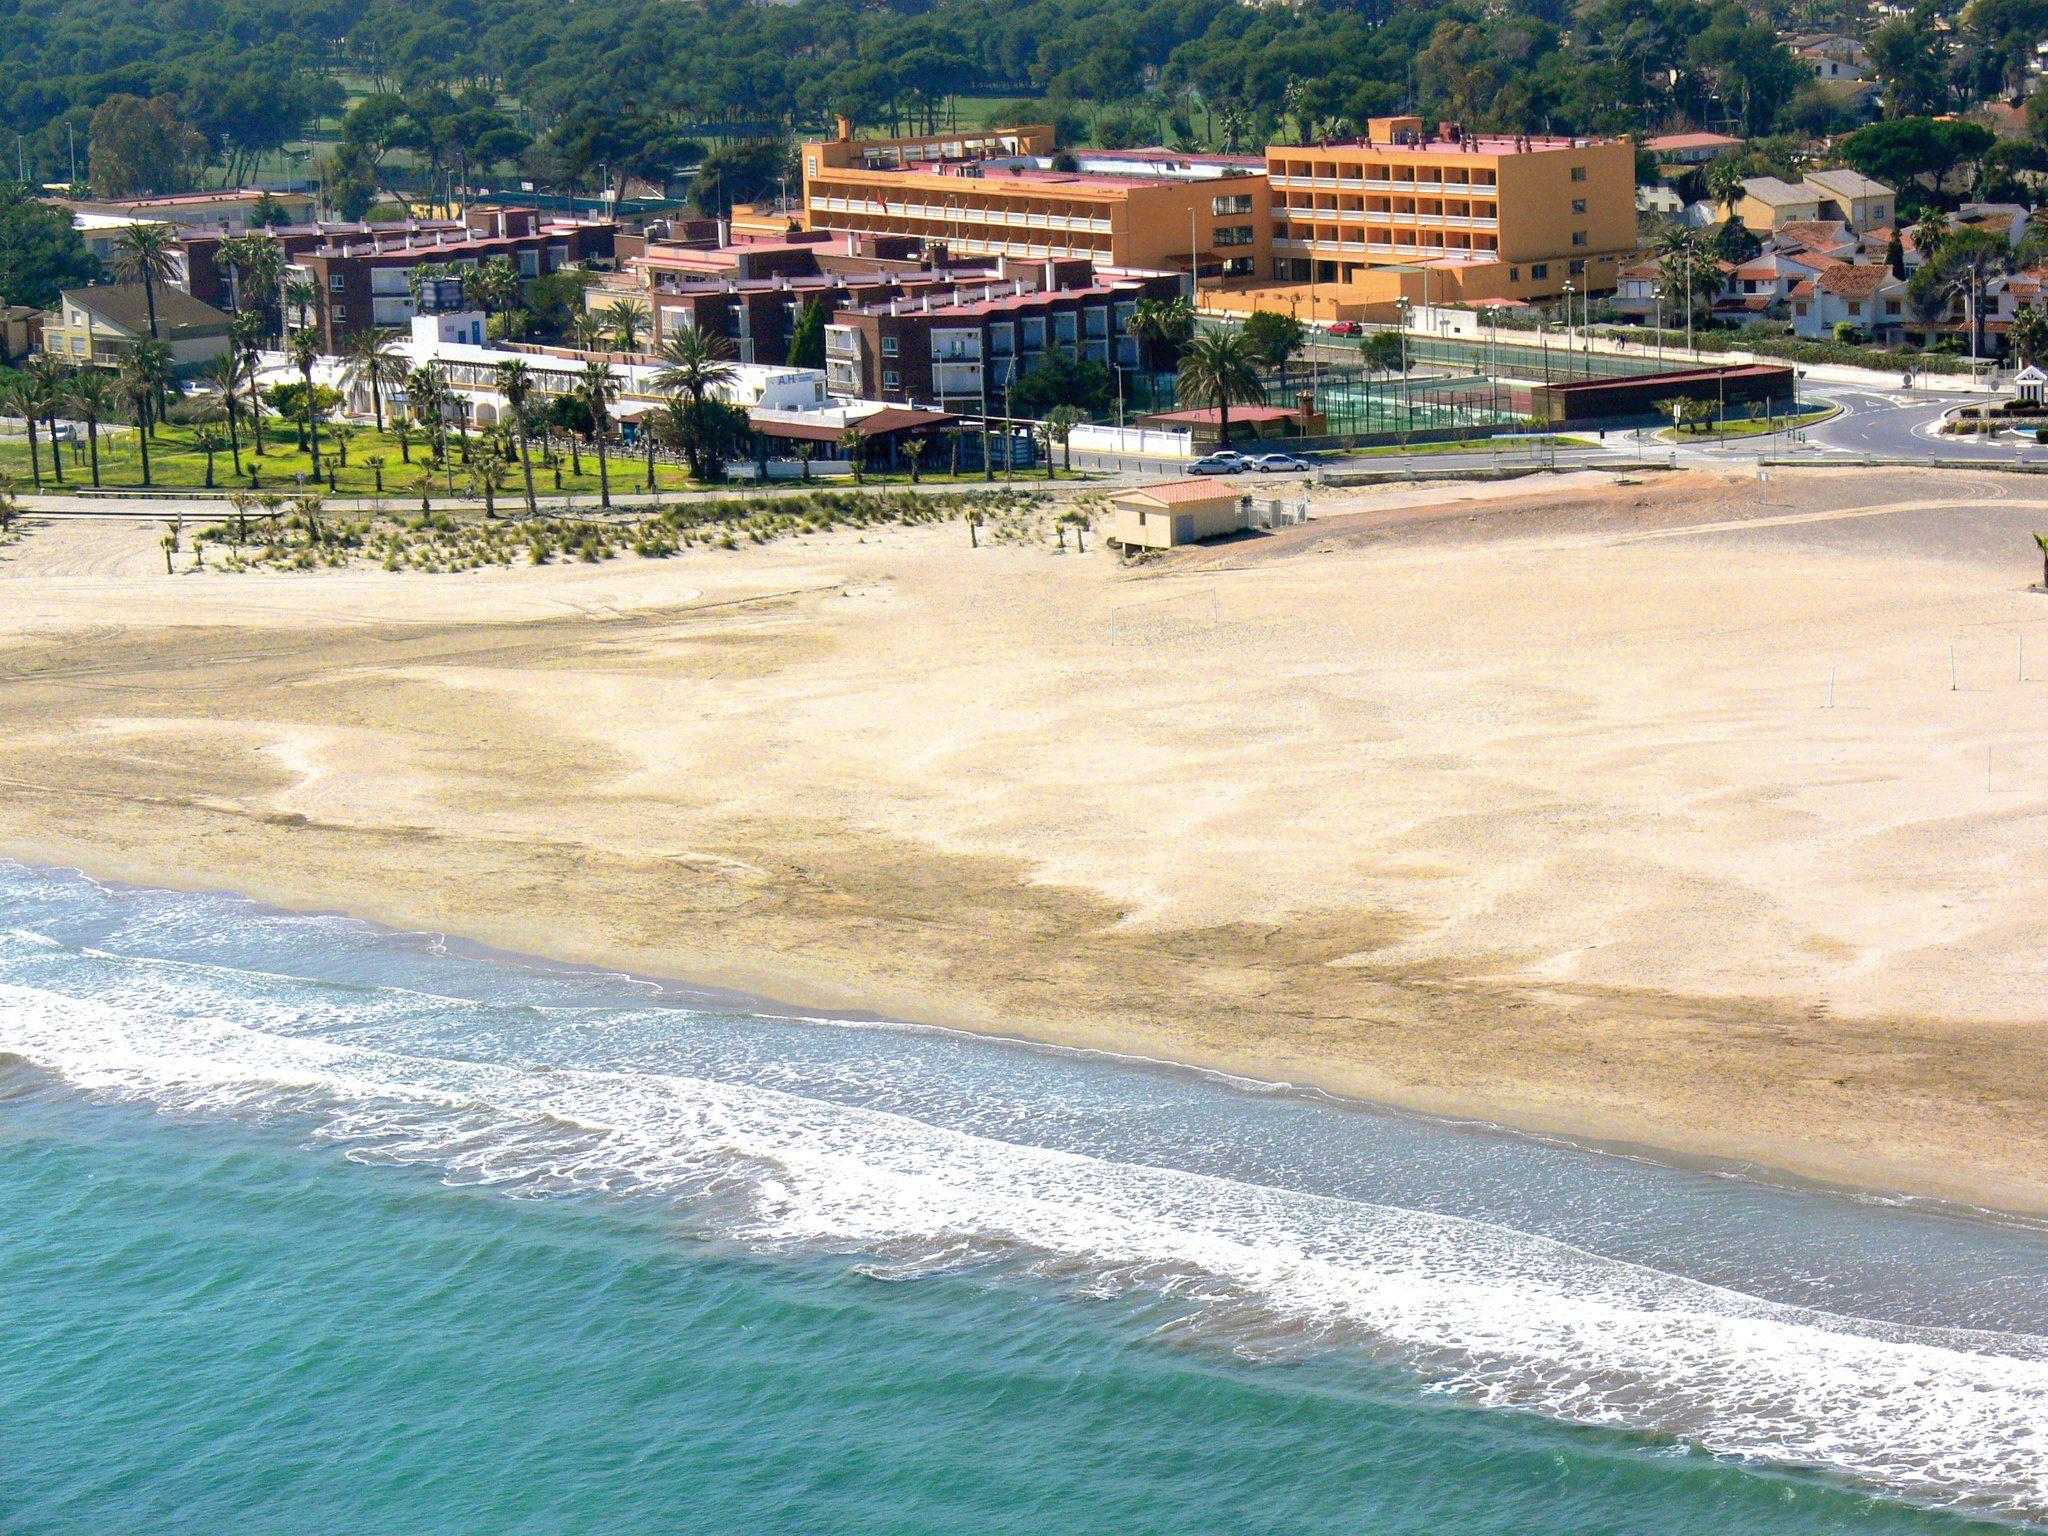 Hotel Del Golf Playa En Castellón Grao De Castellon Castellon Playa